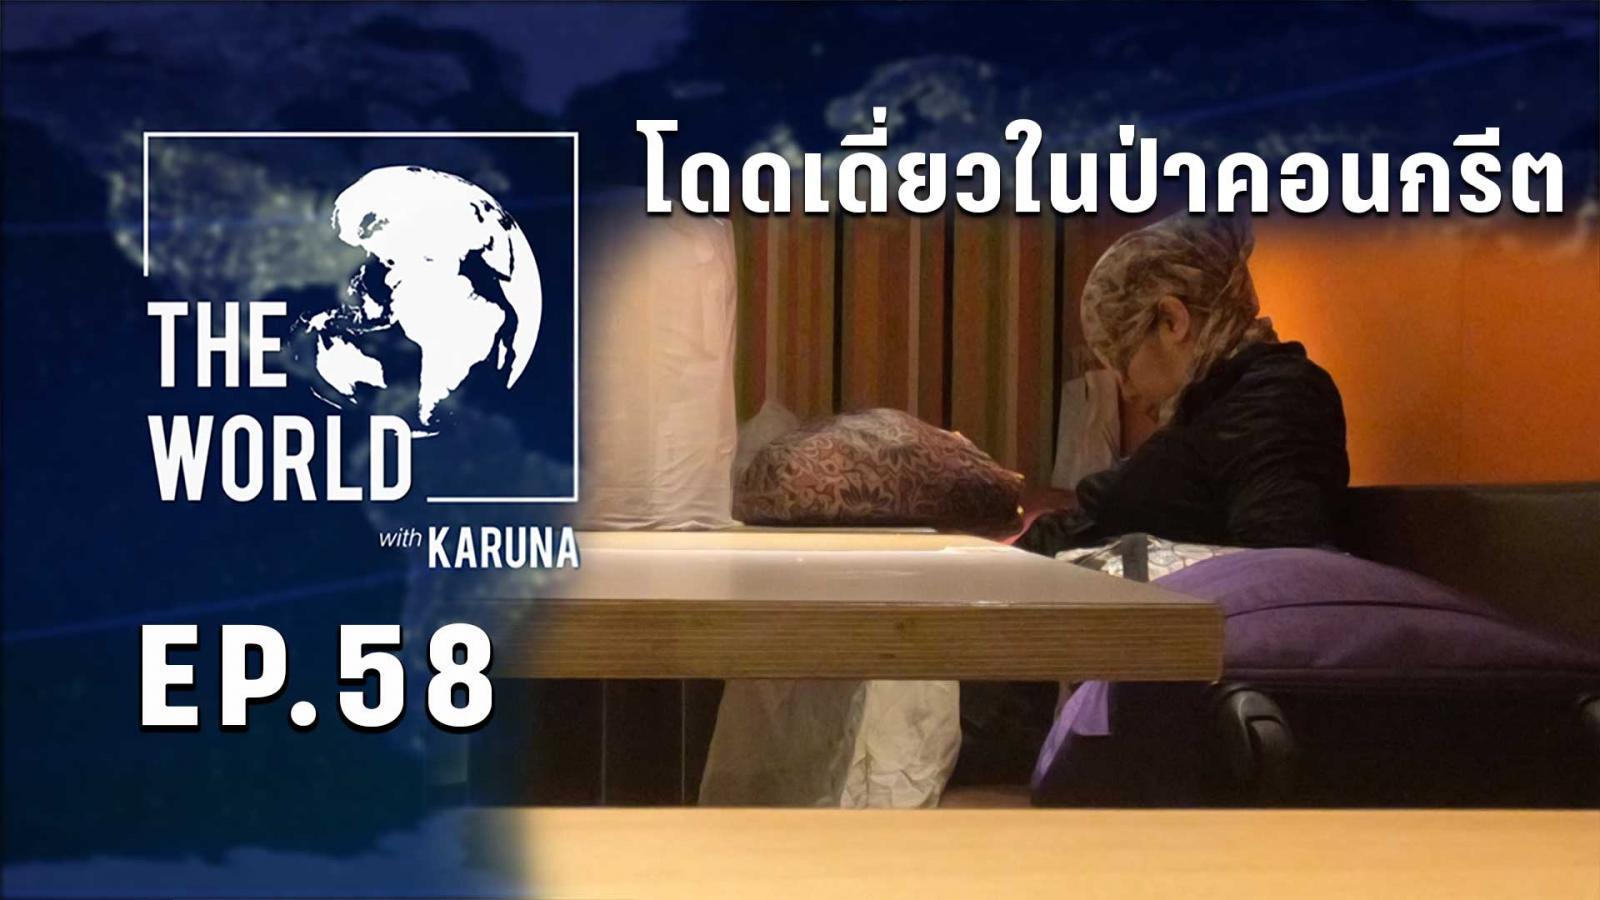 The World with KARUNA